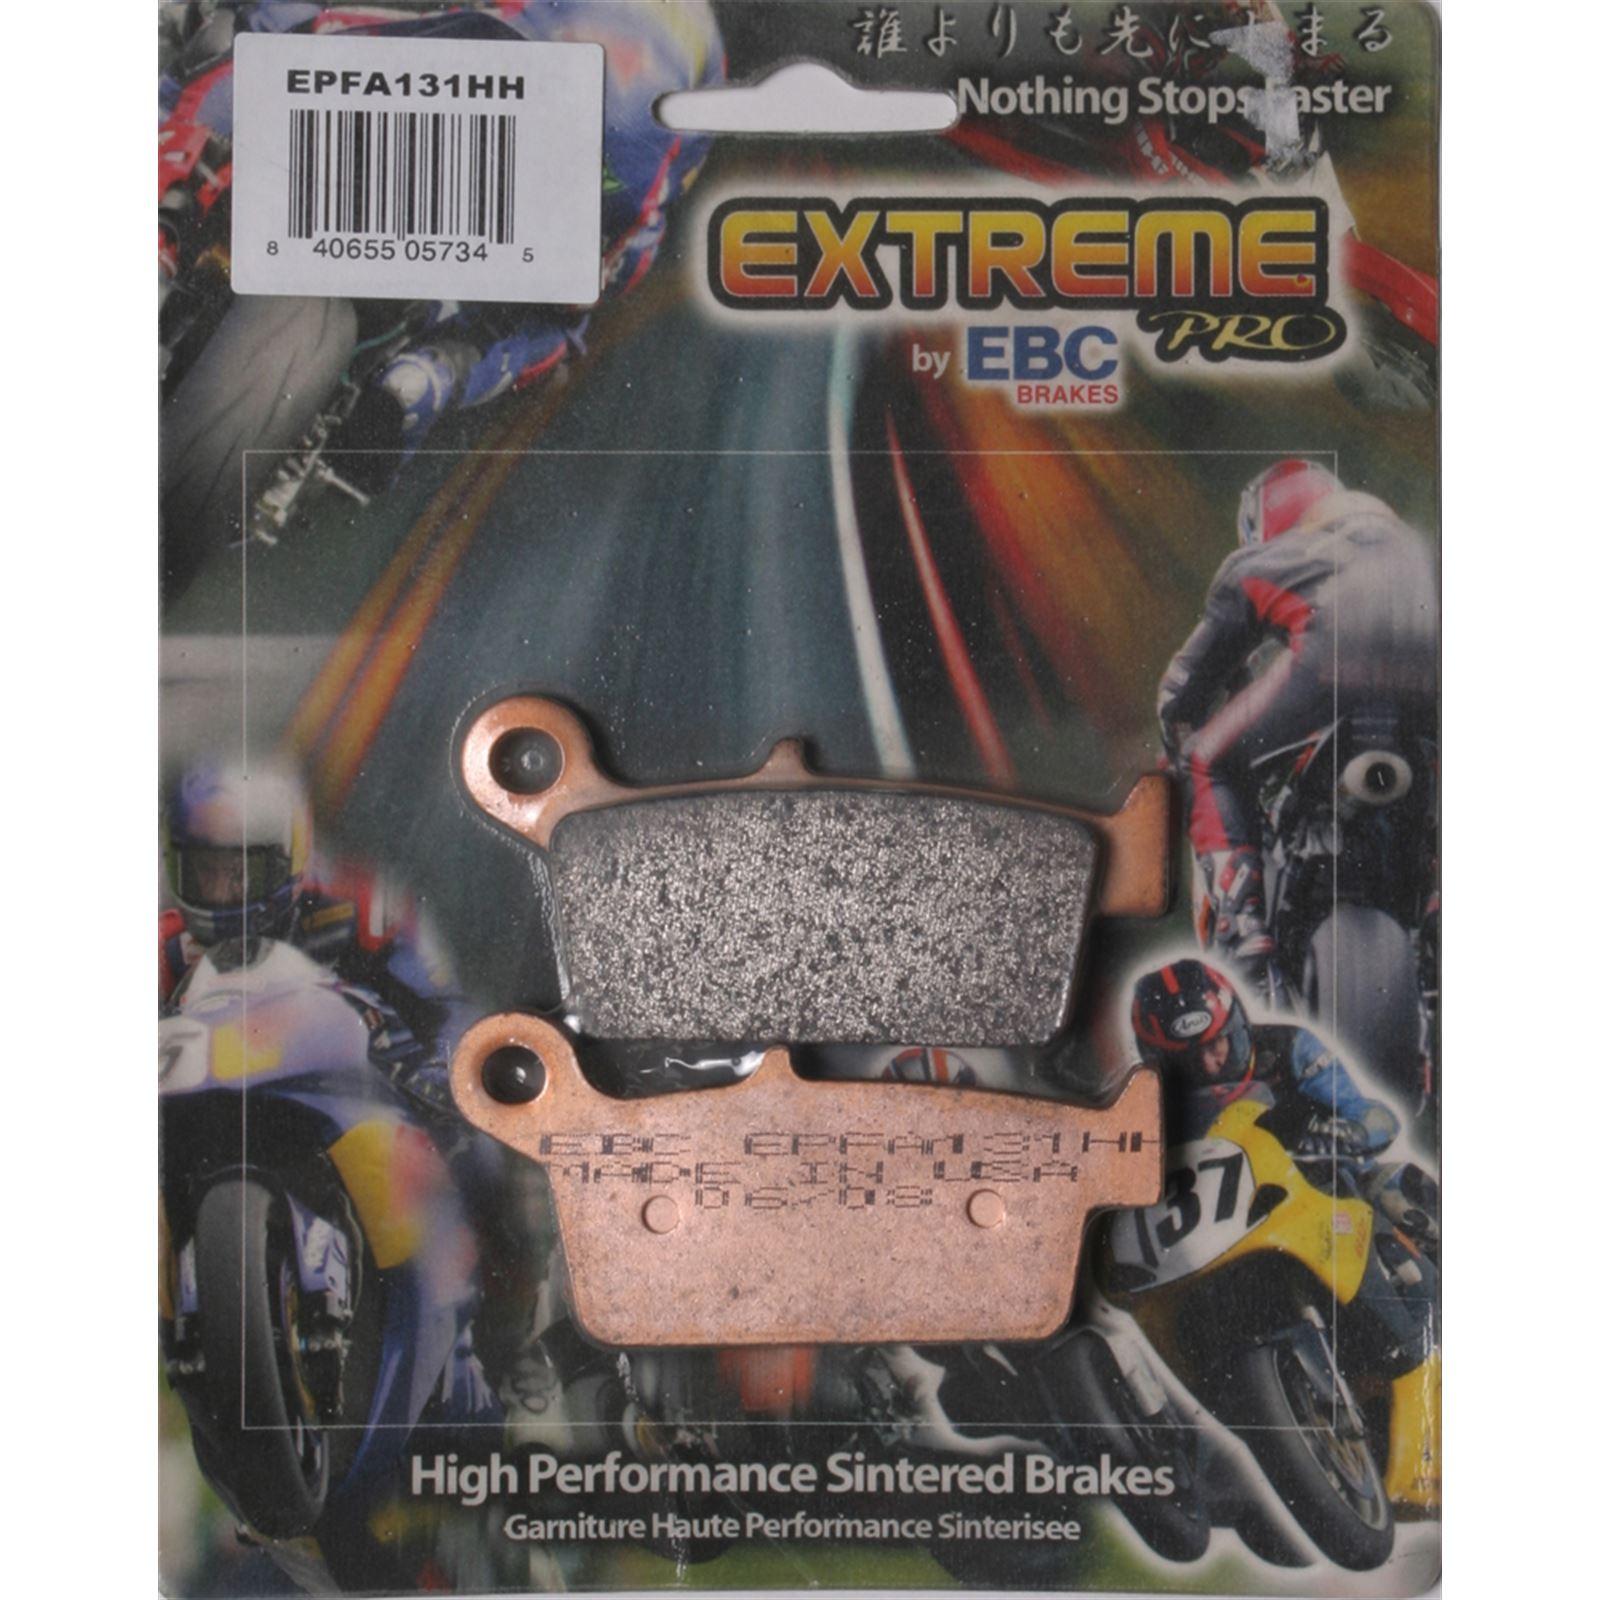 EBC Extreme Pro Brake Pads